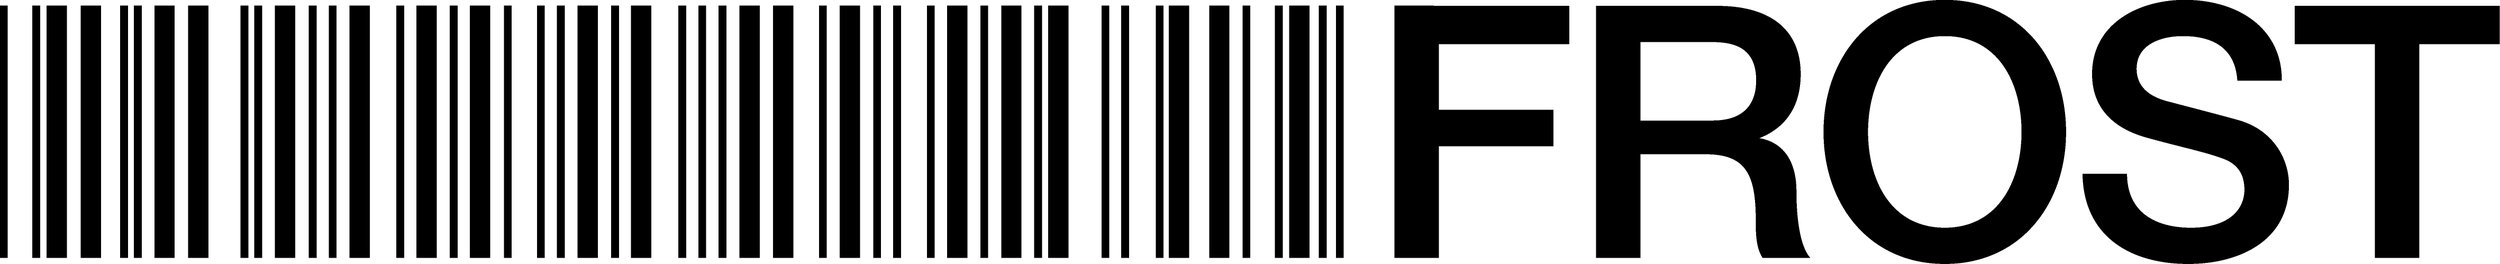 FROST logo - large.jpg